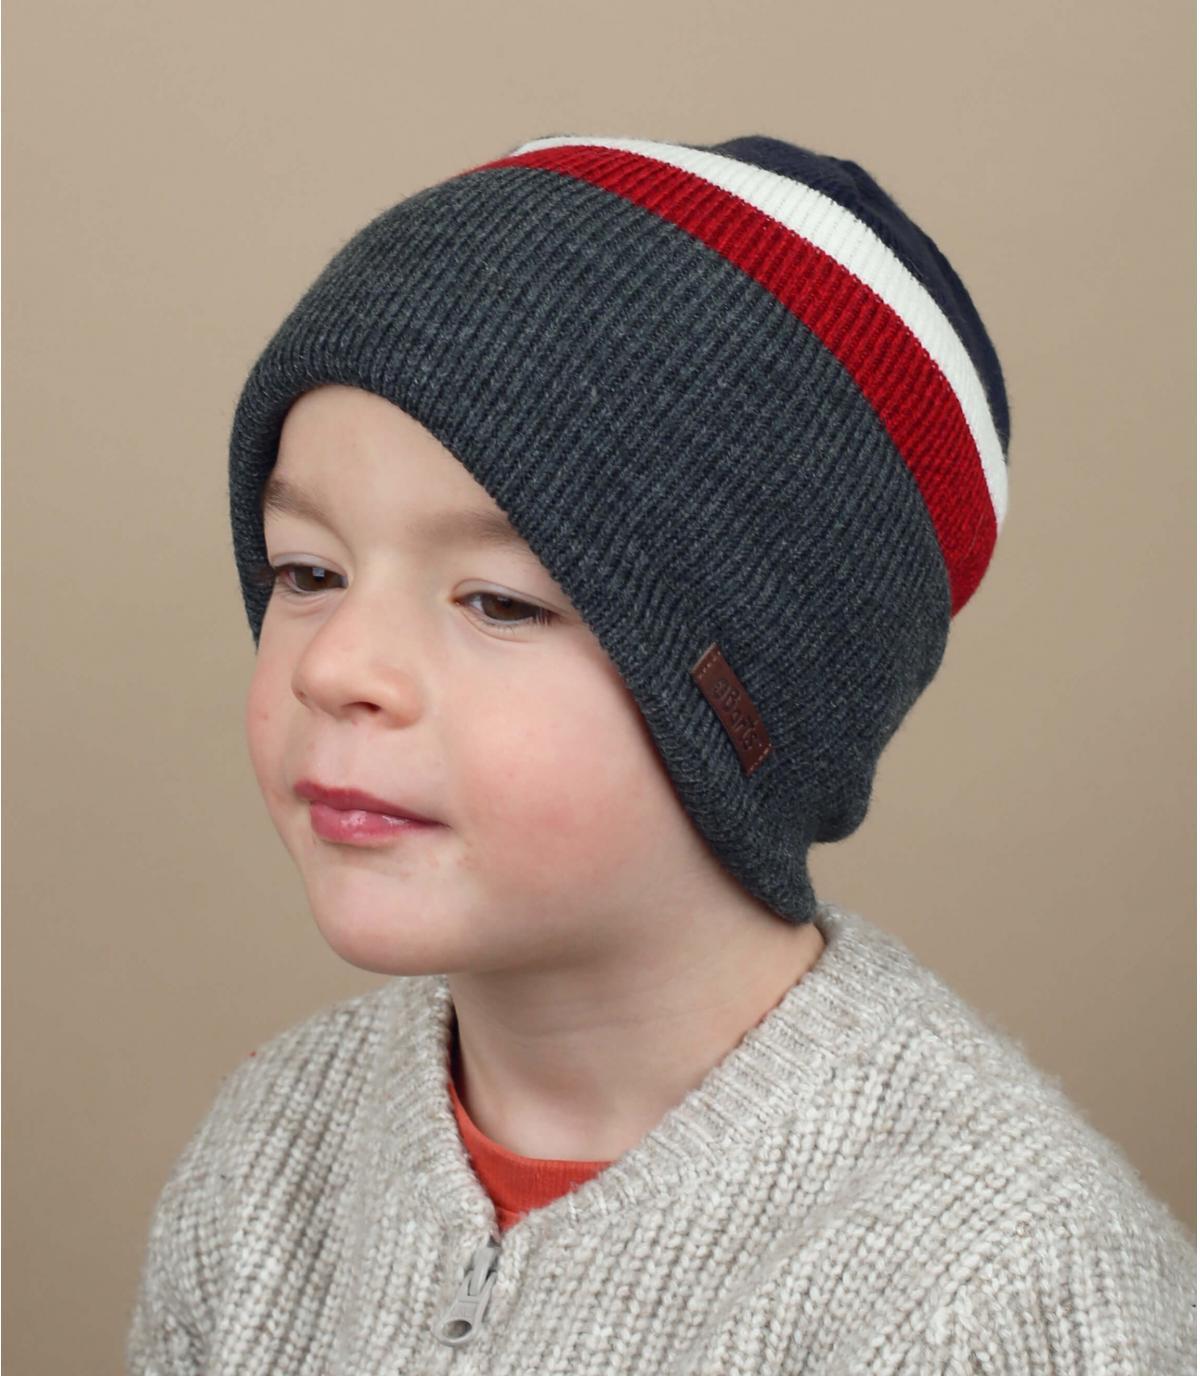 gorro niño gris azul rojo